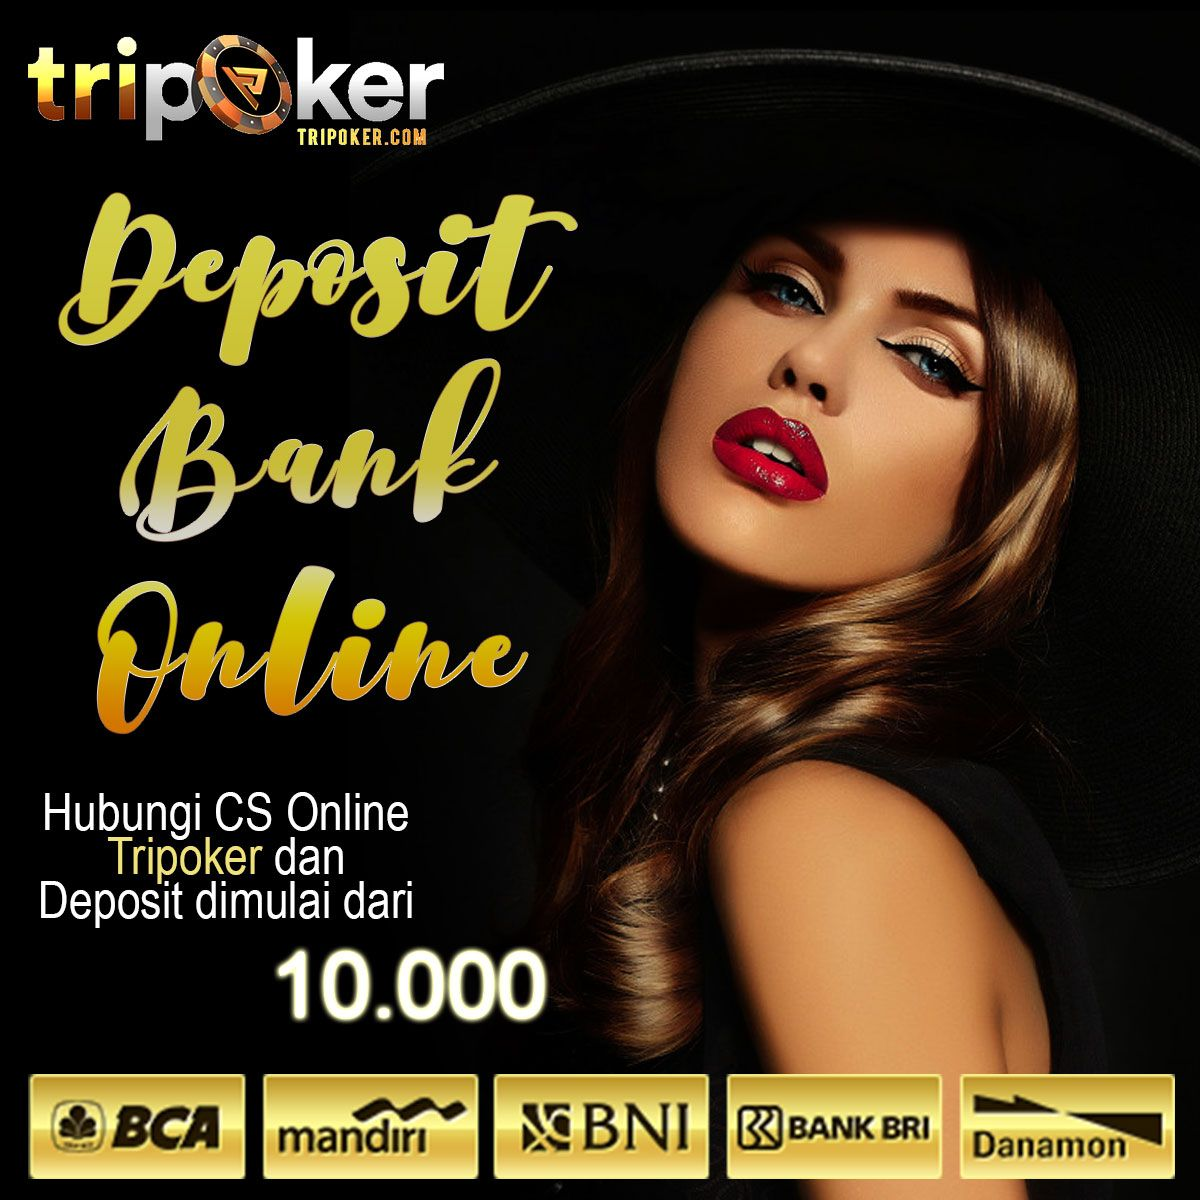 70 Idn Poker Uang Asli Ideas Poker Movie Posters Poker Bonus